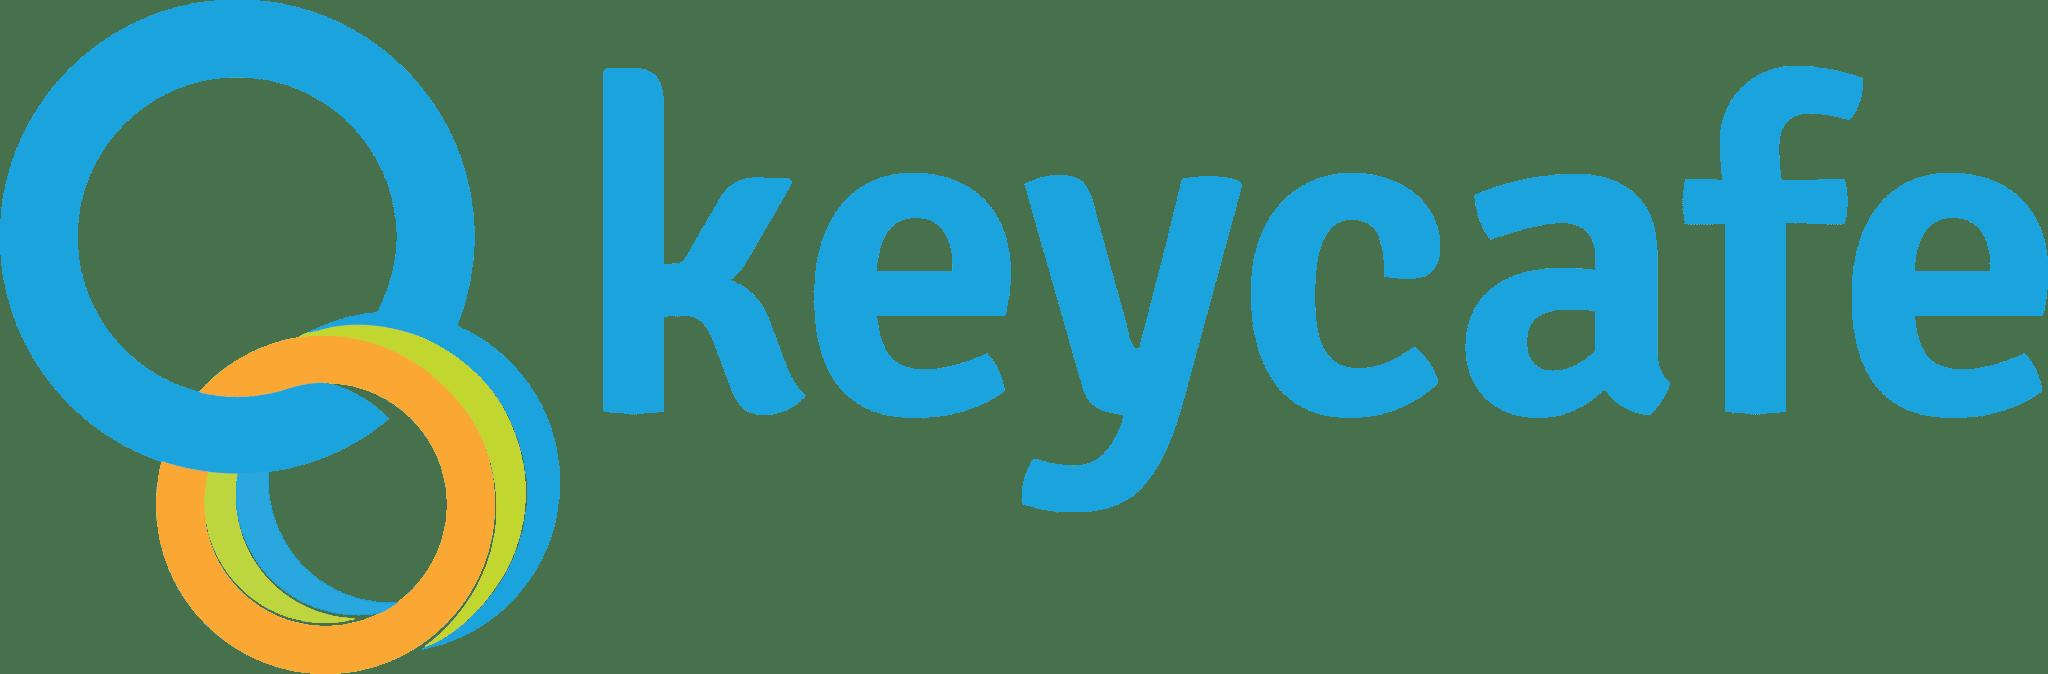 Key exchange solution